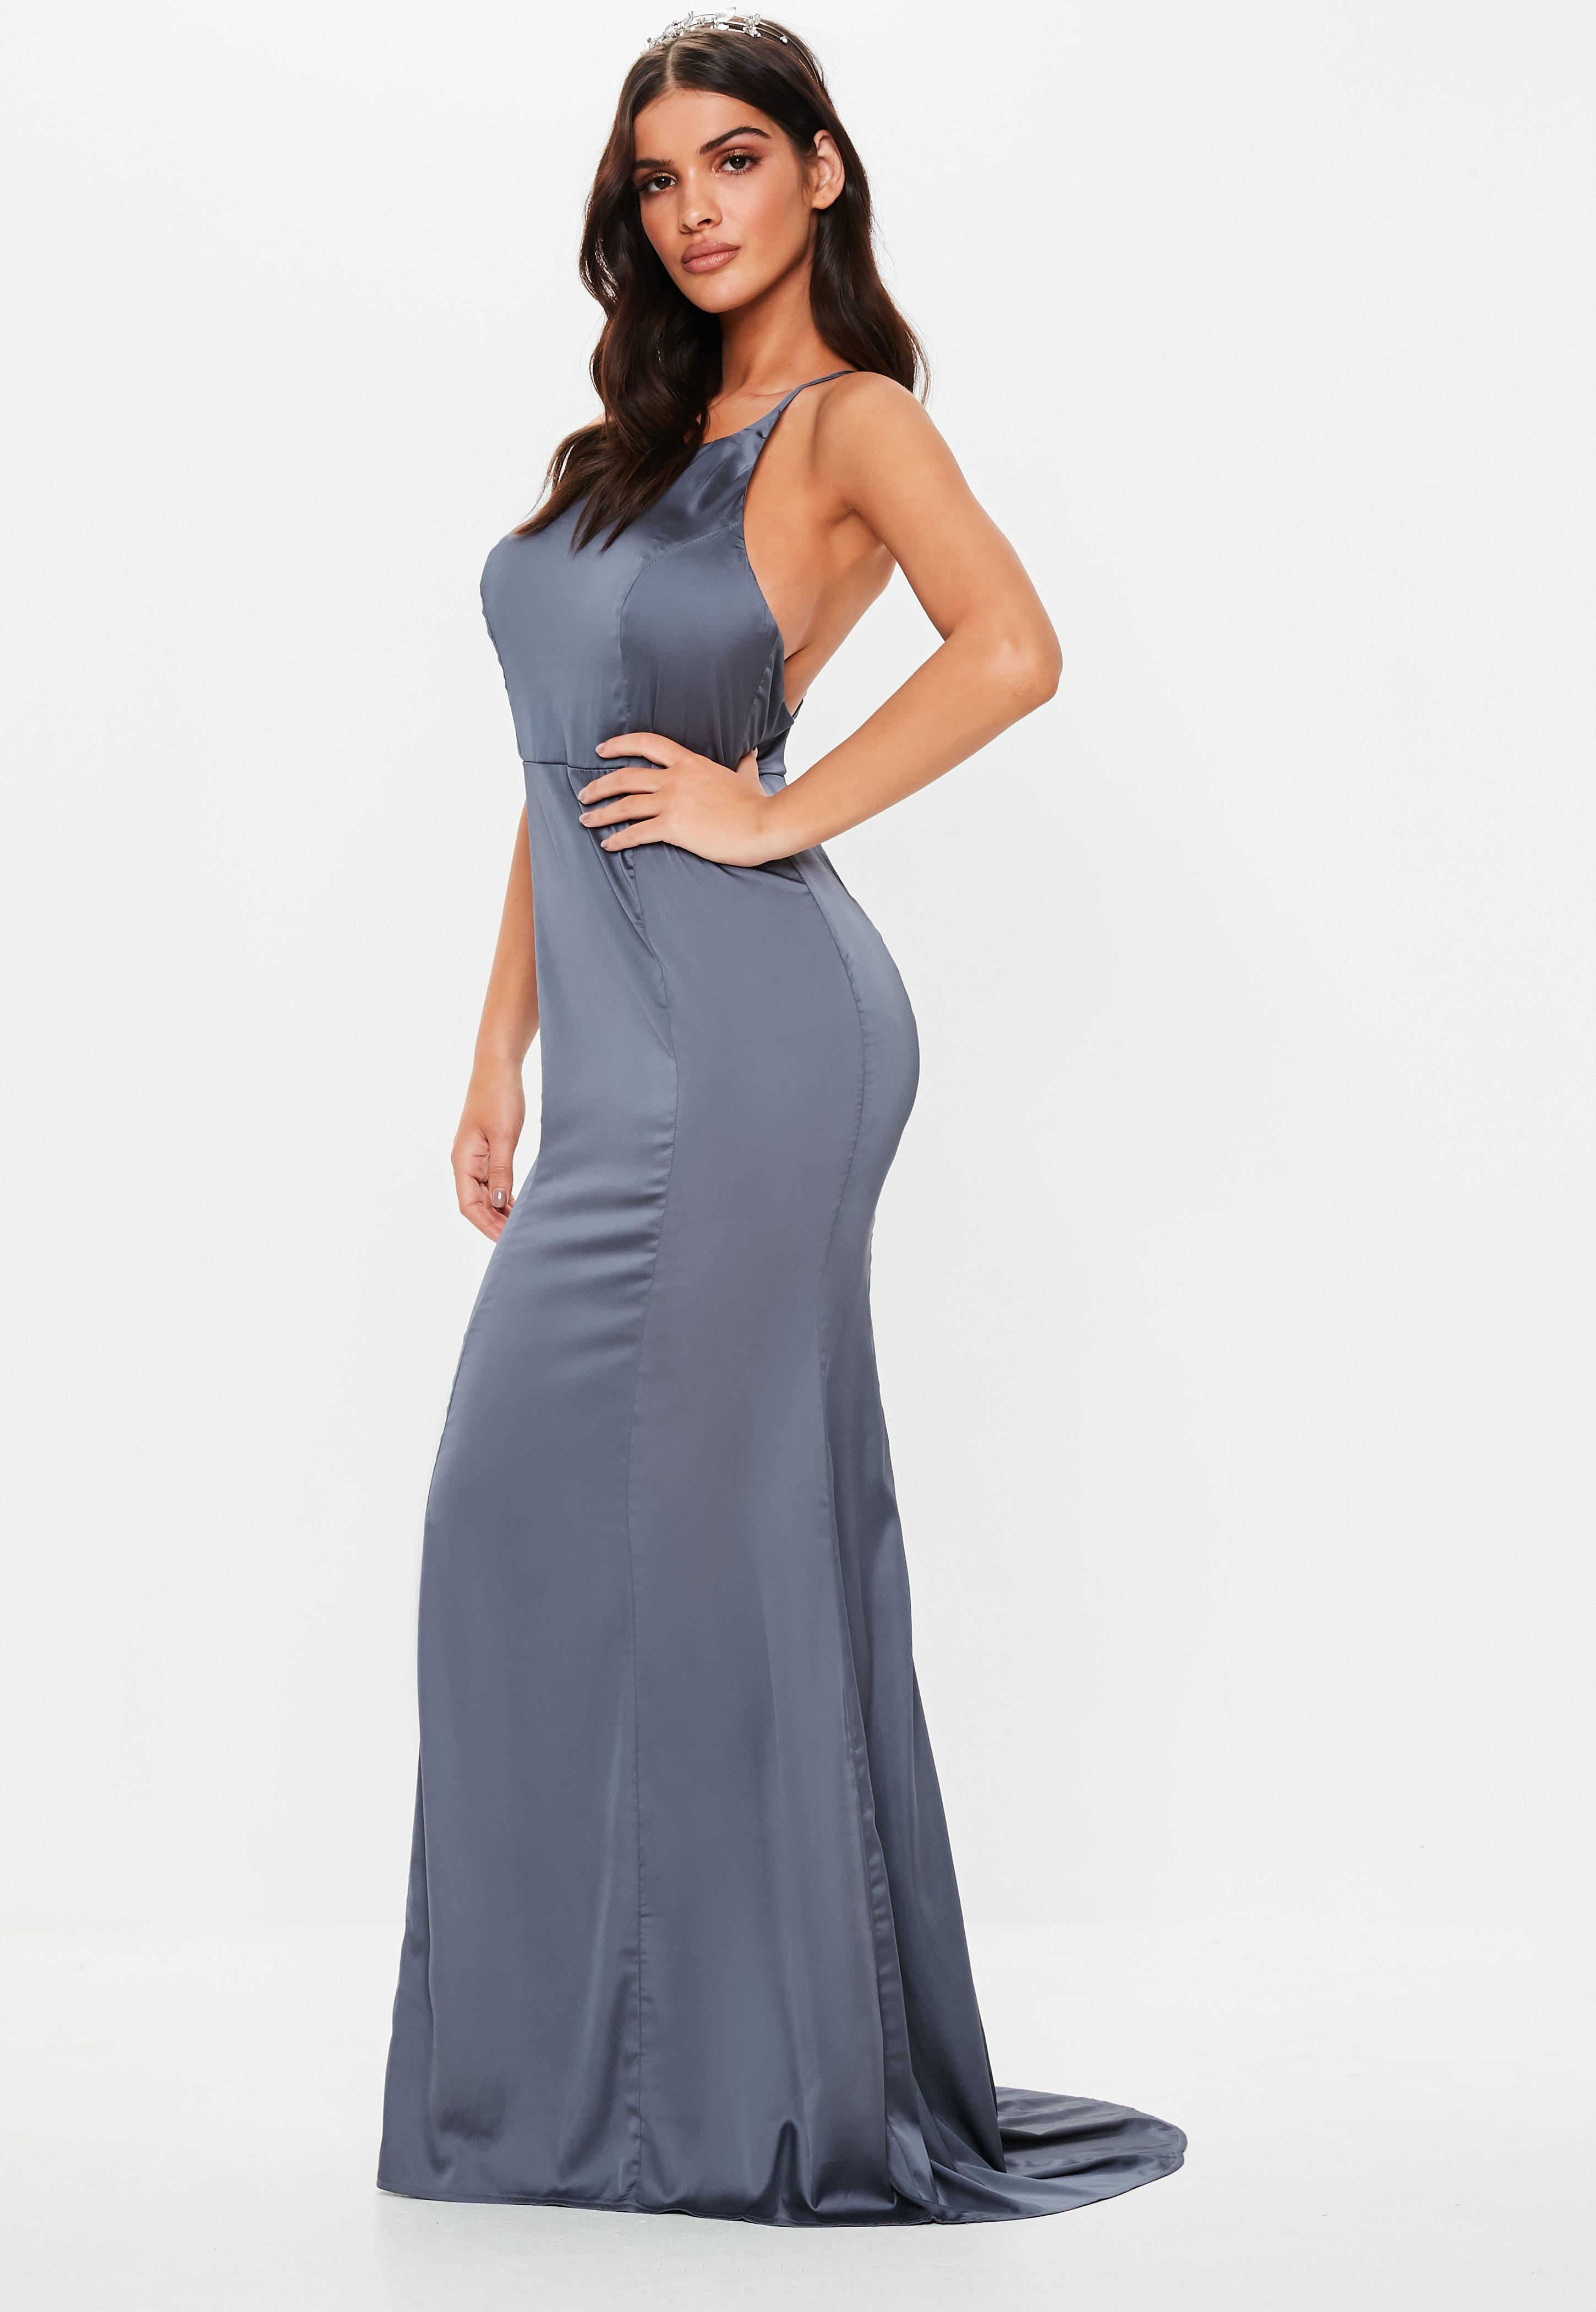 4657bffbcb Backless Dresses